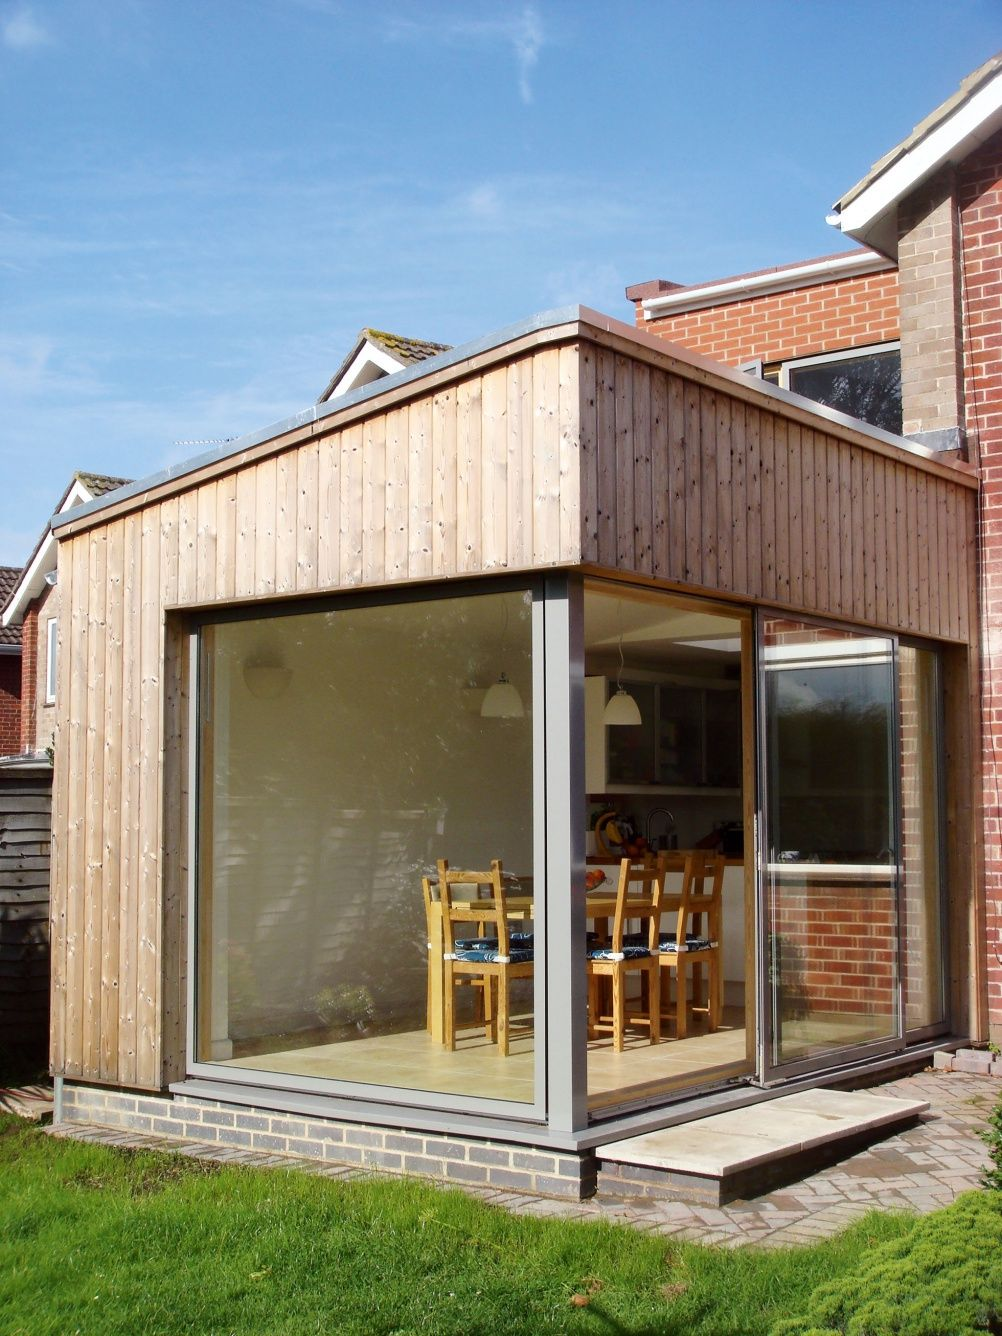 1 Dhv Dsc01806 Wooden Cladding Extension Garden Room